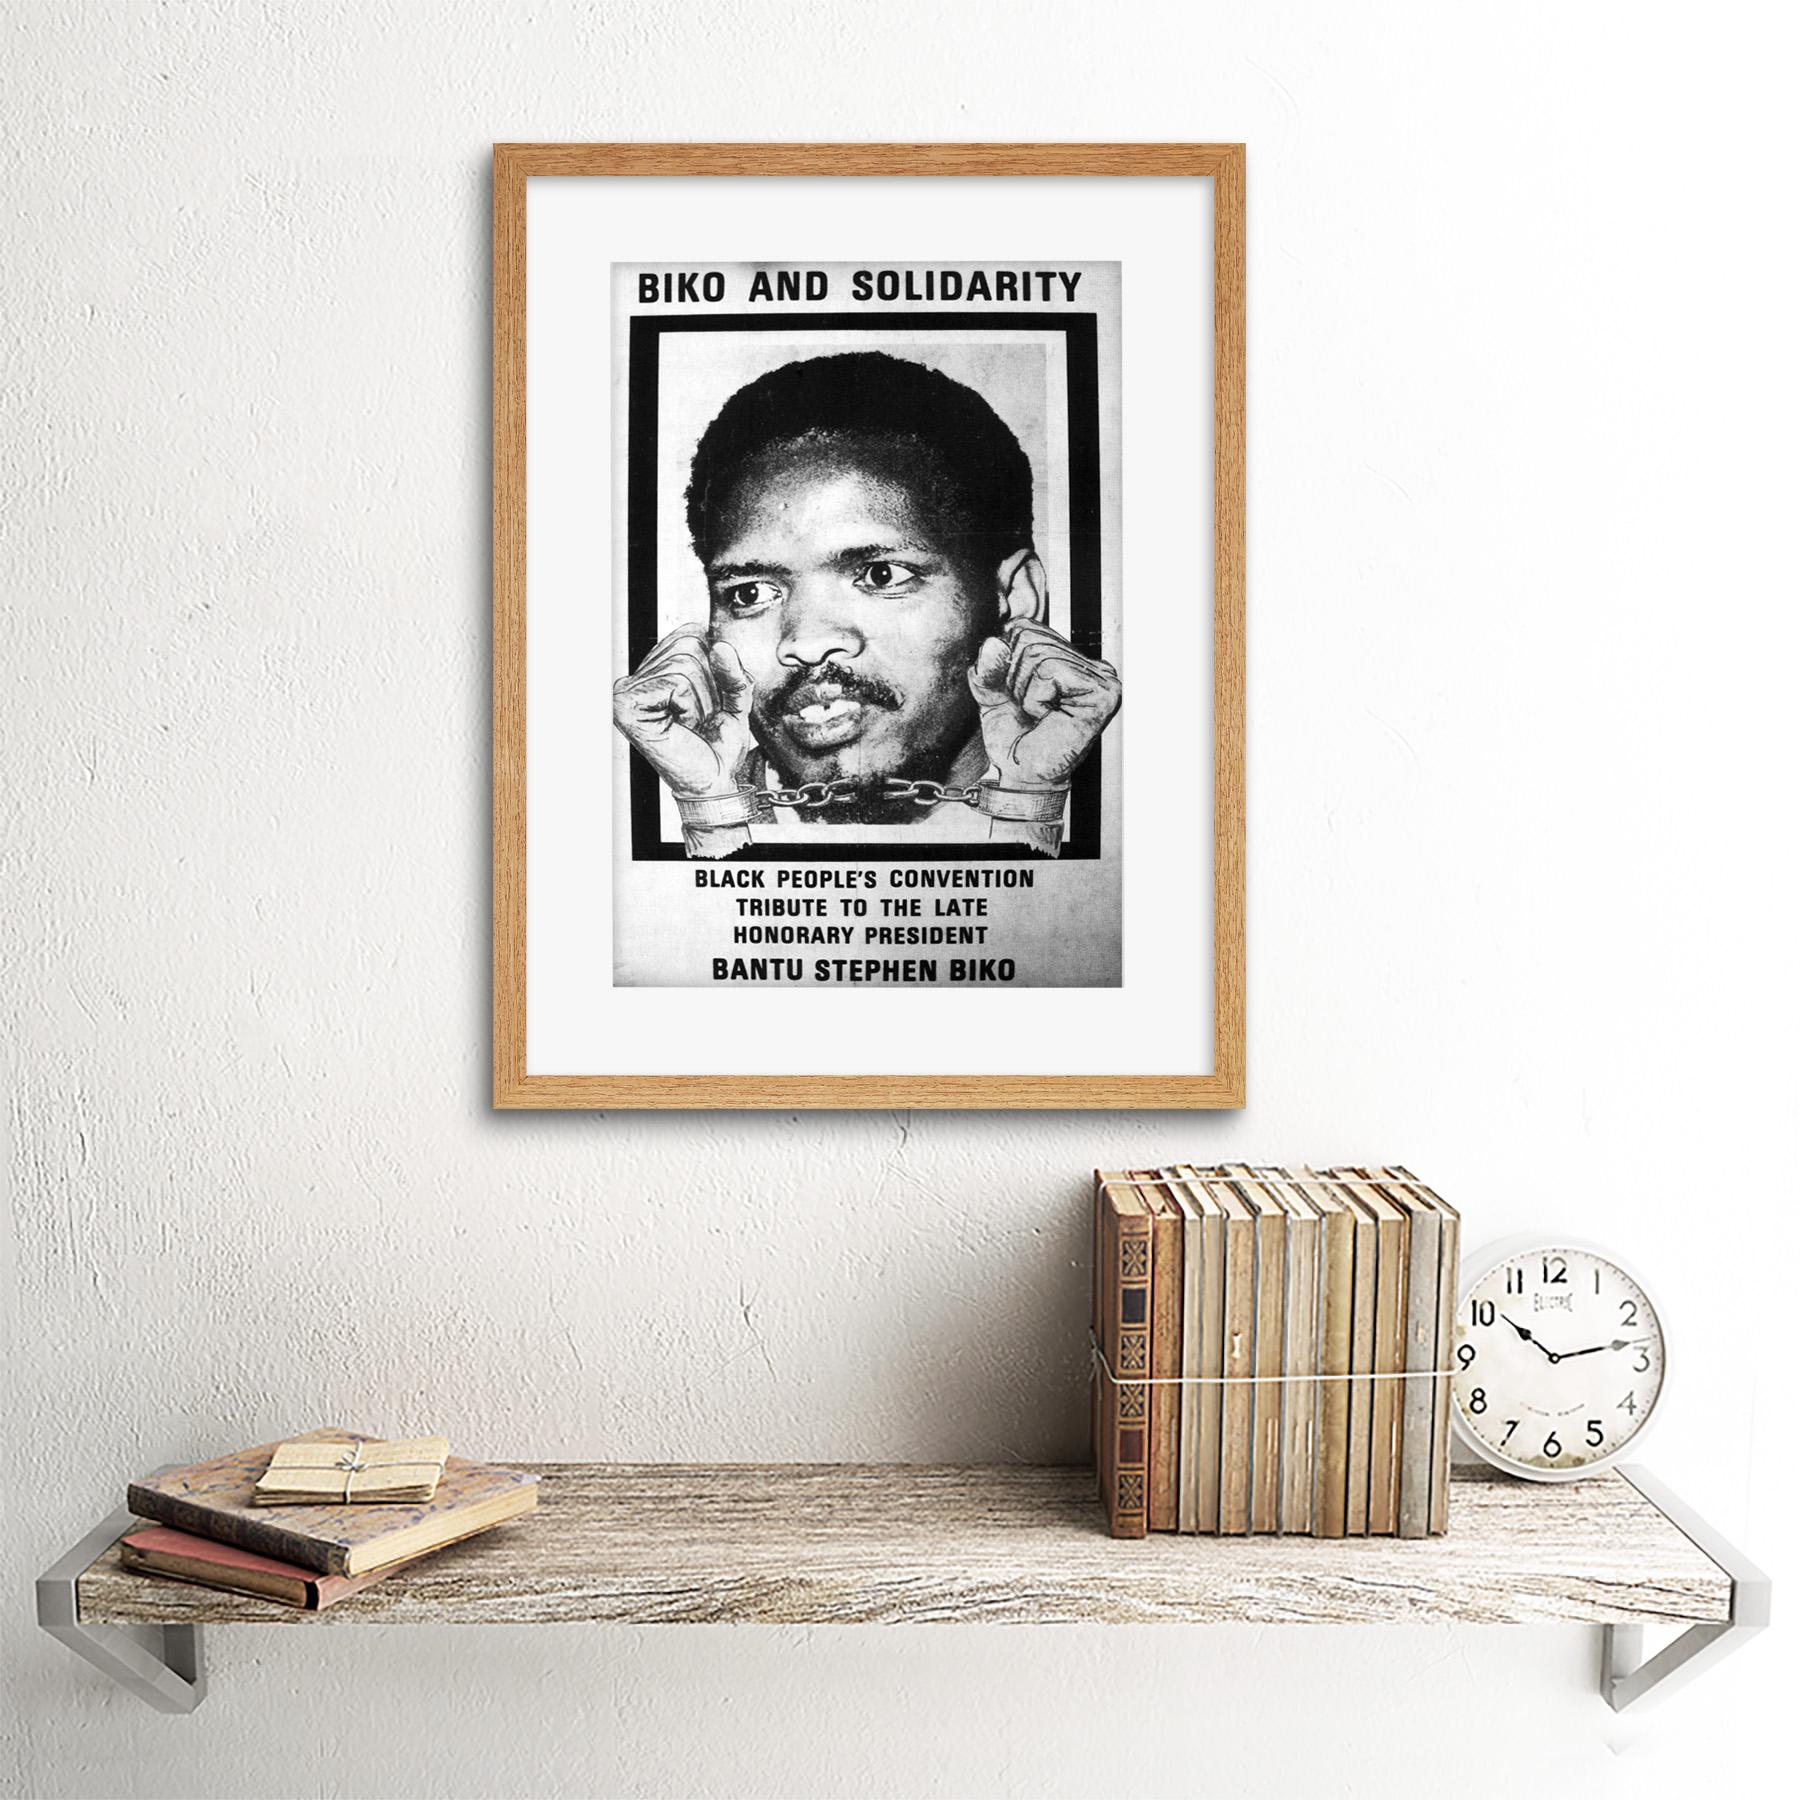 thumbnail 11 - Political Steve Biko Anc Apartheid South Africa Framed Wall Art Print